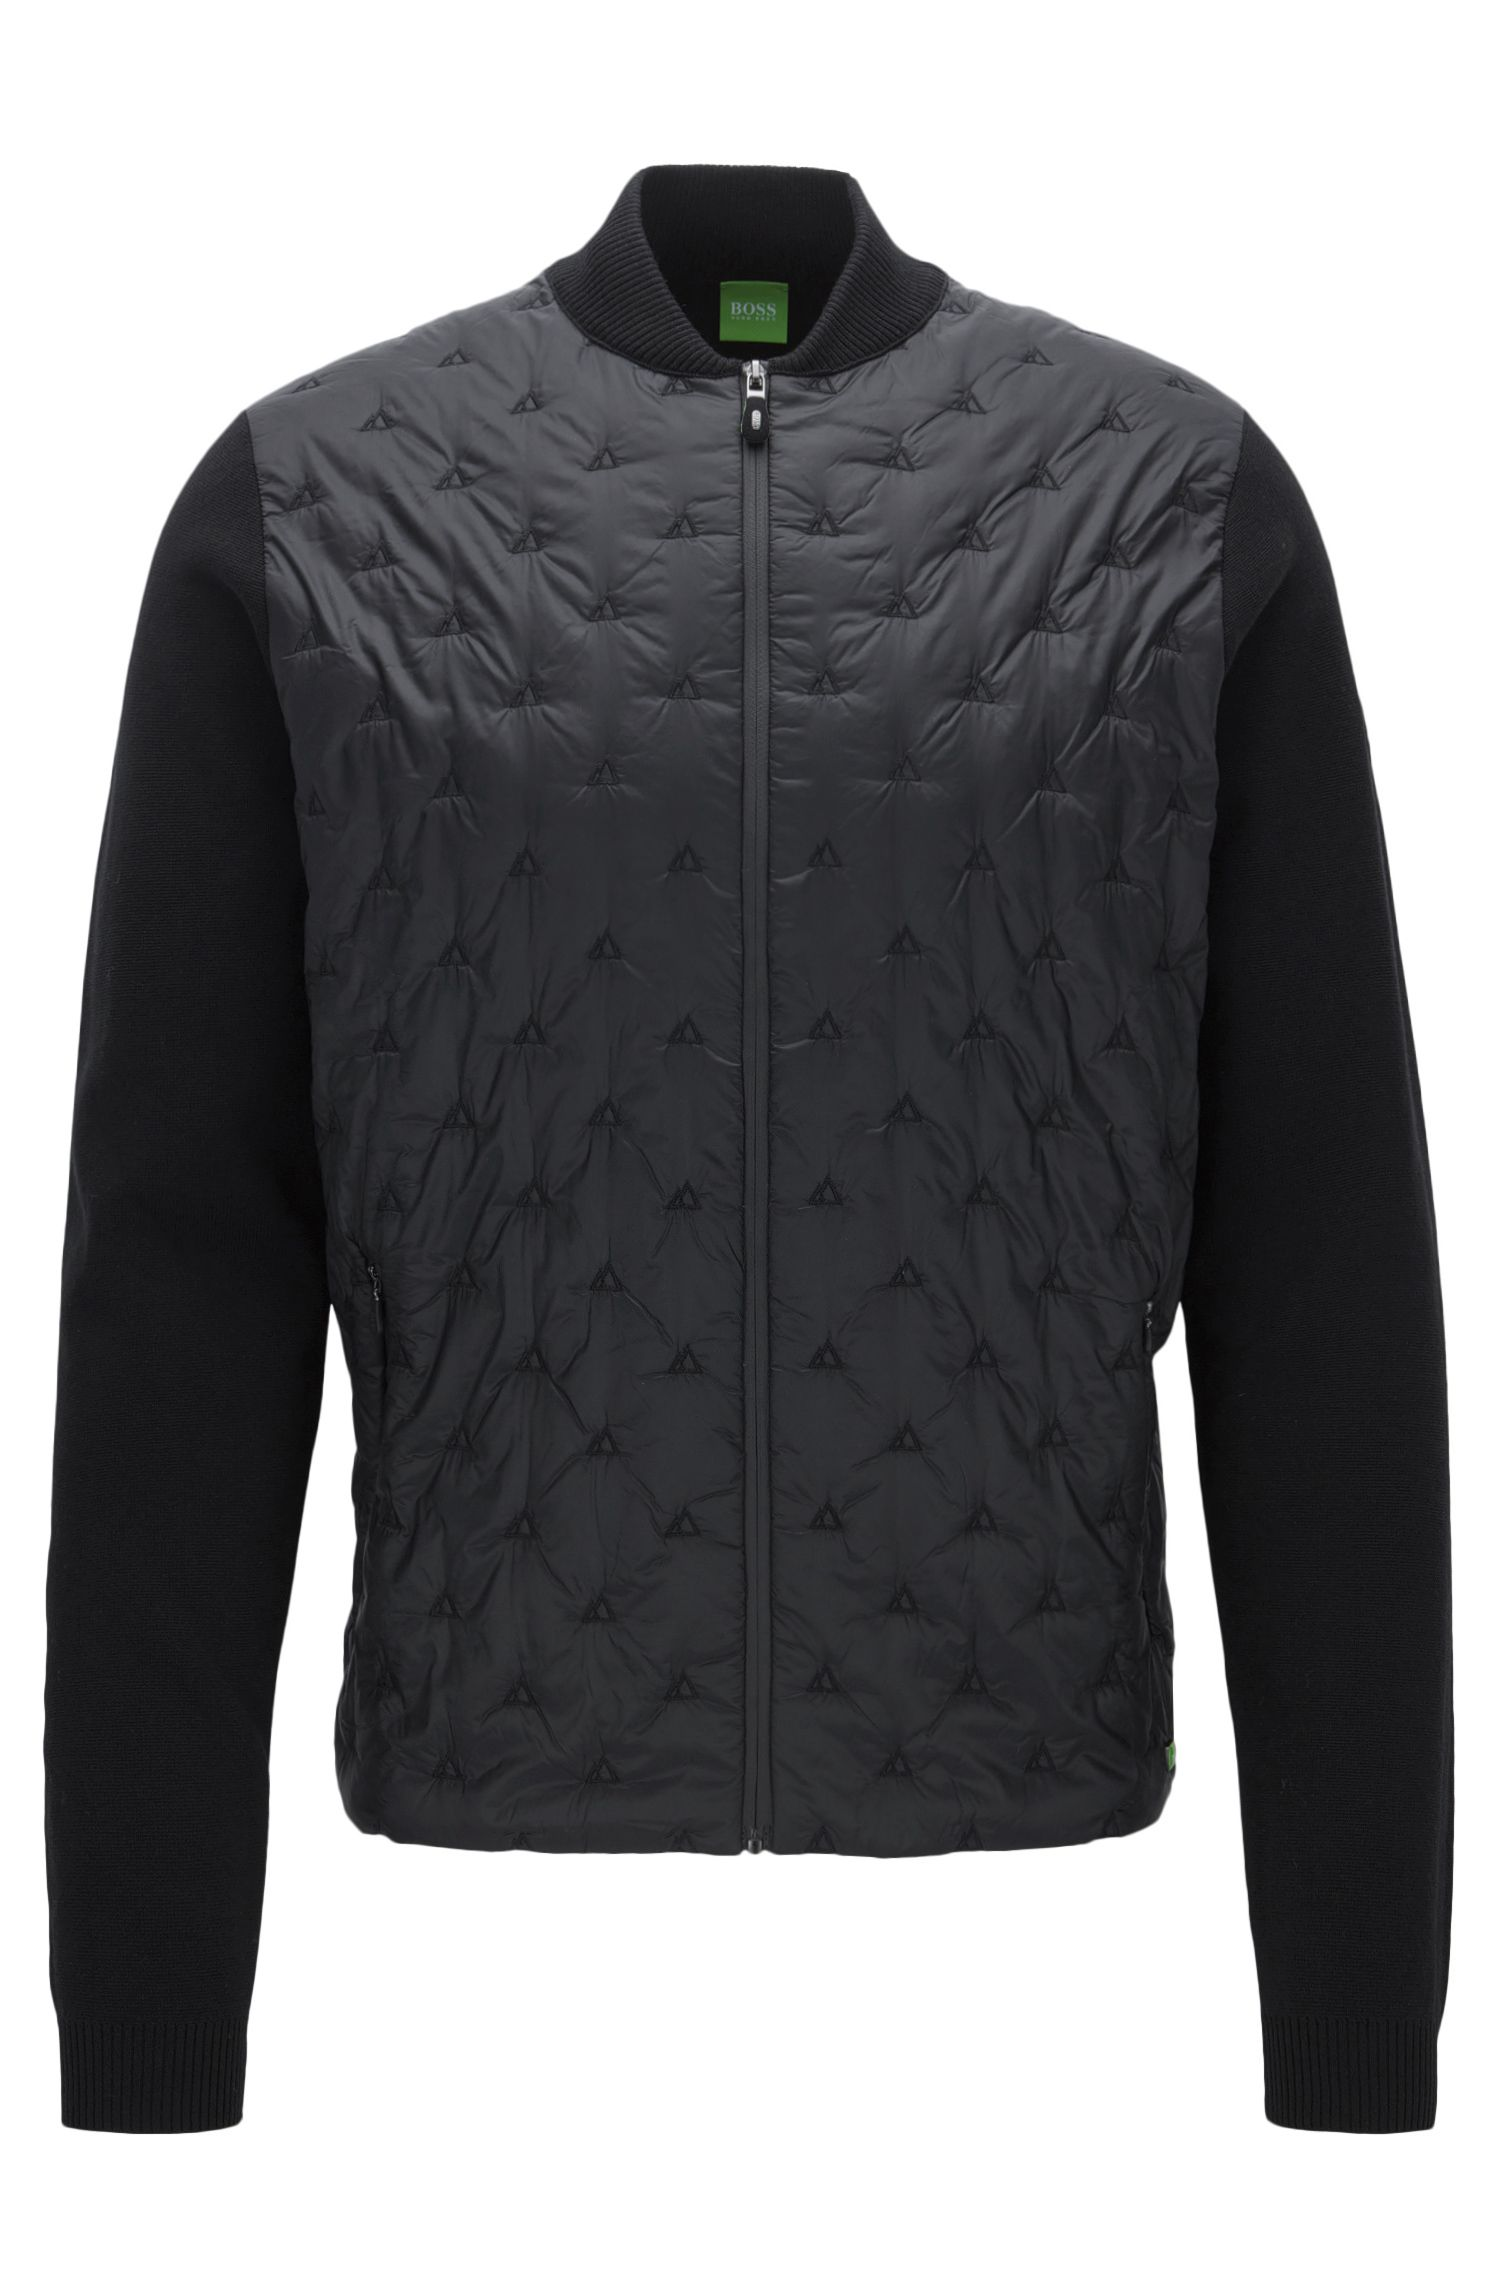 Pintucked Nylon & Cotton Blend Jacket | Zimen